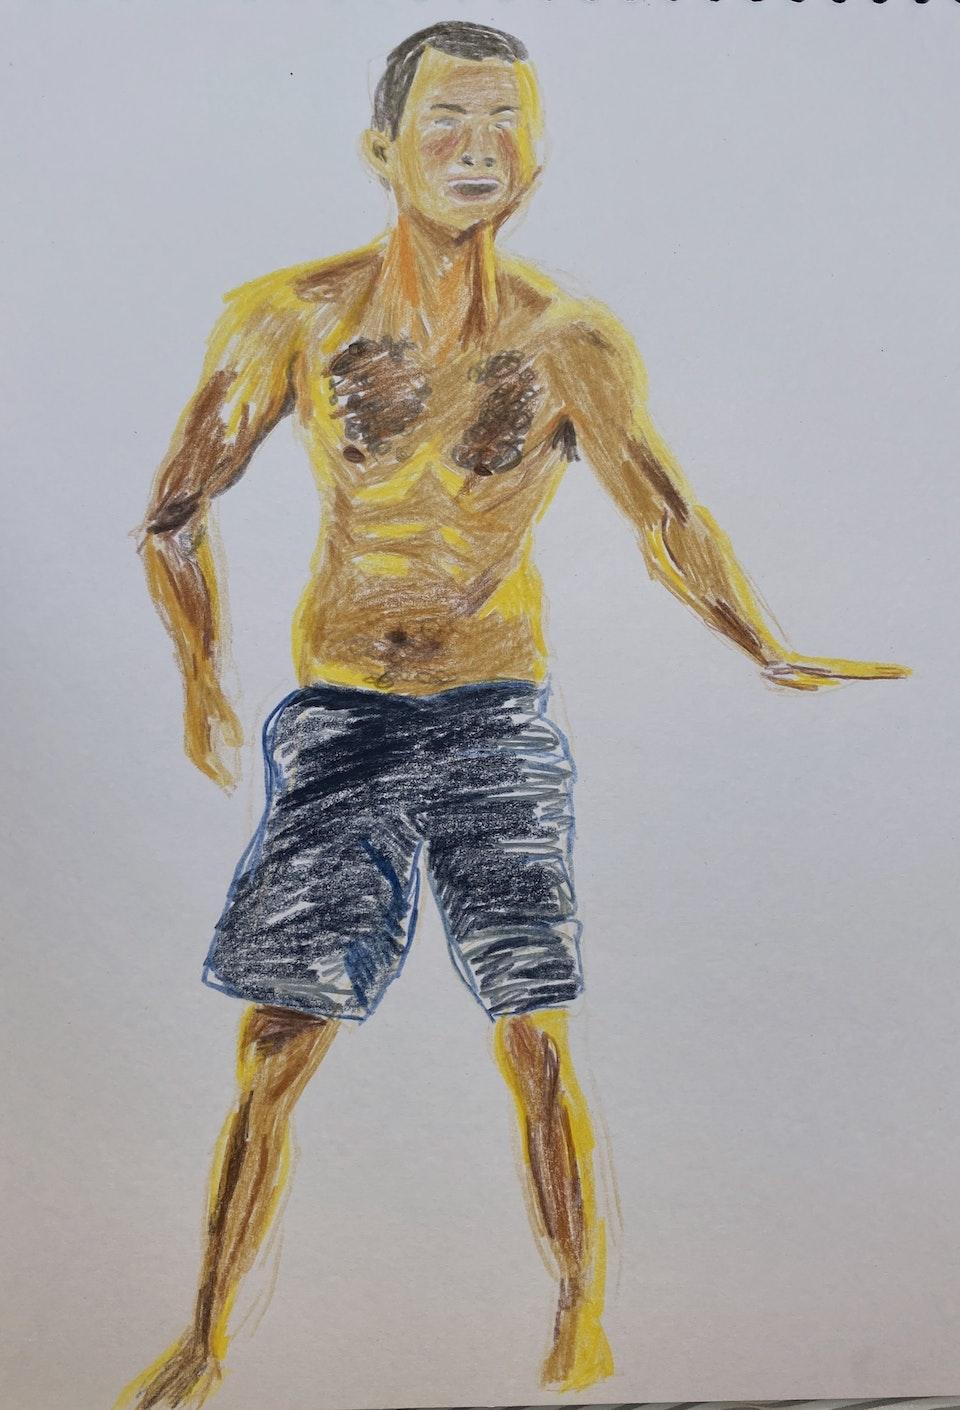 Portraits - Gustav - 2020  - Pencil on Paper - 21 x 29 cm A4